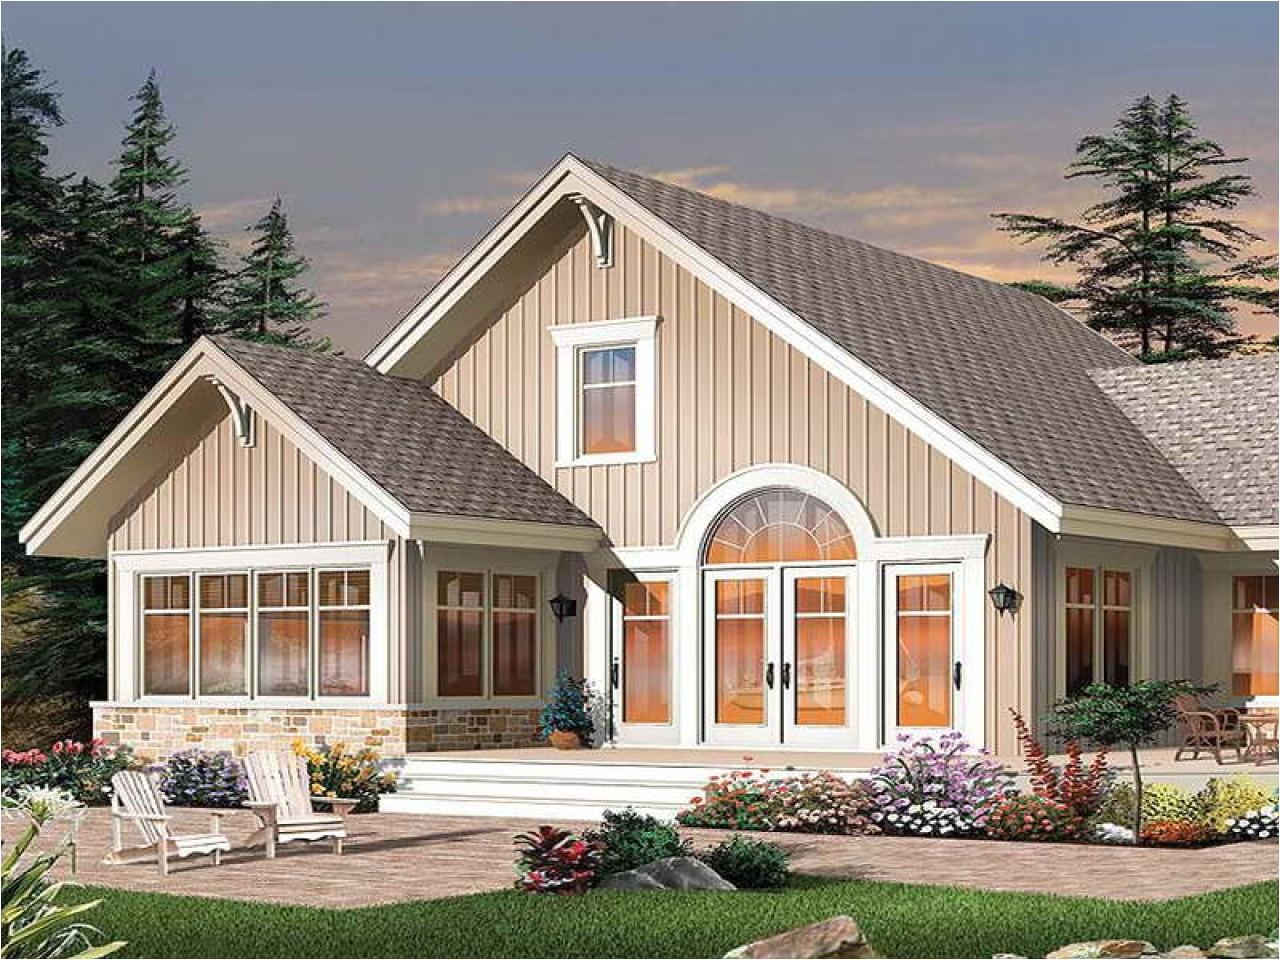 a2dbad35f51c1eec small farm house plans old farmhouse style house plans